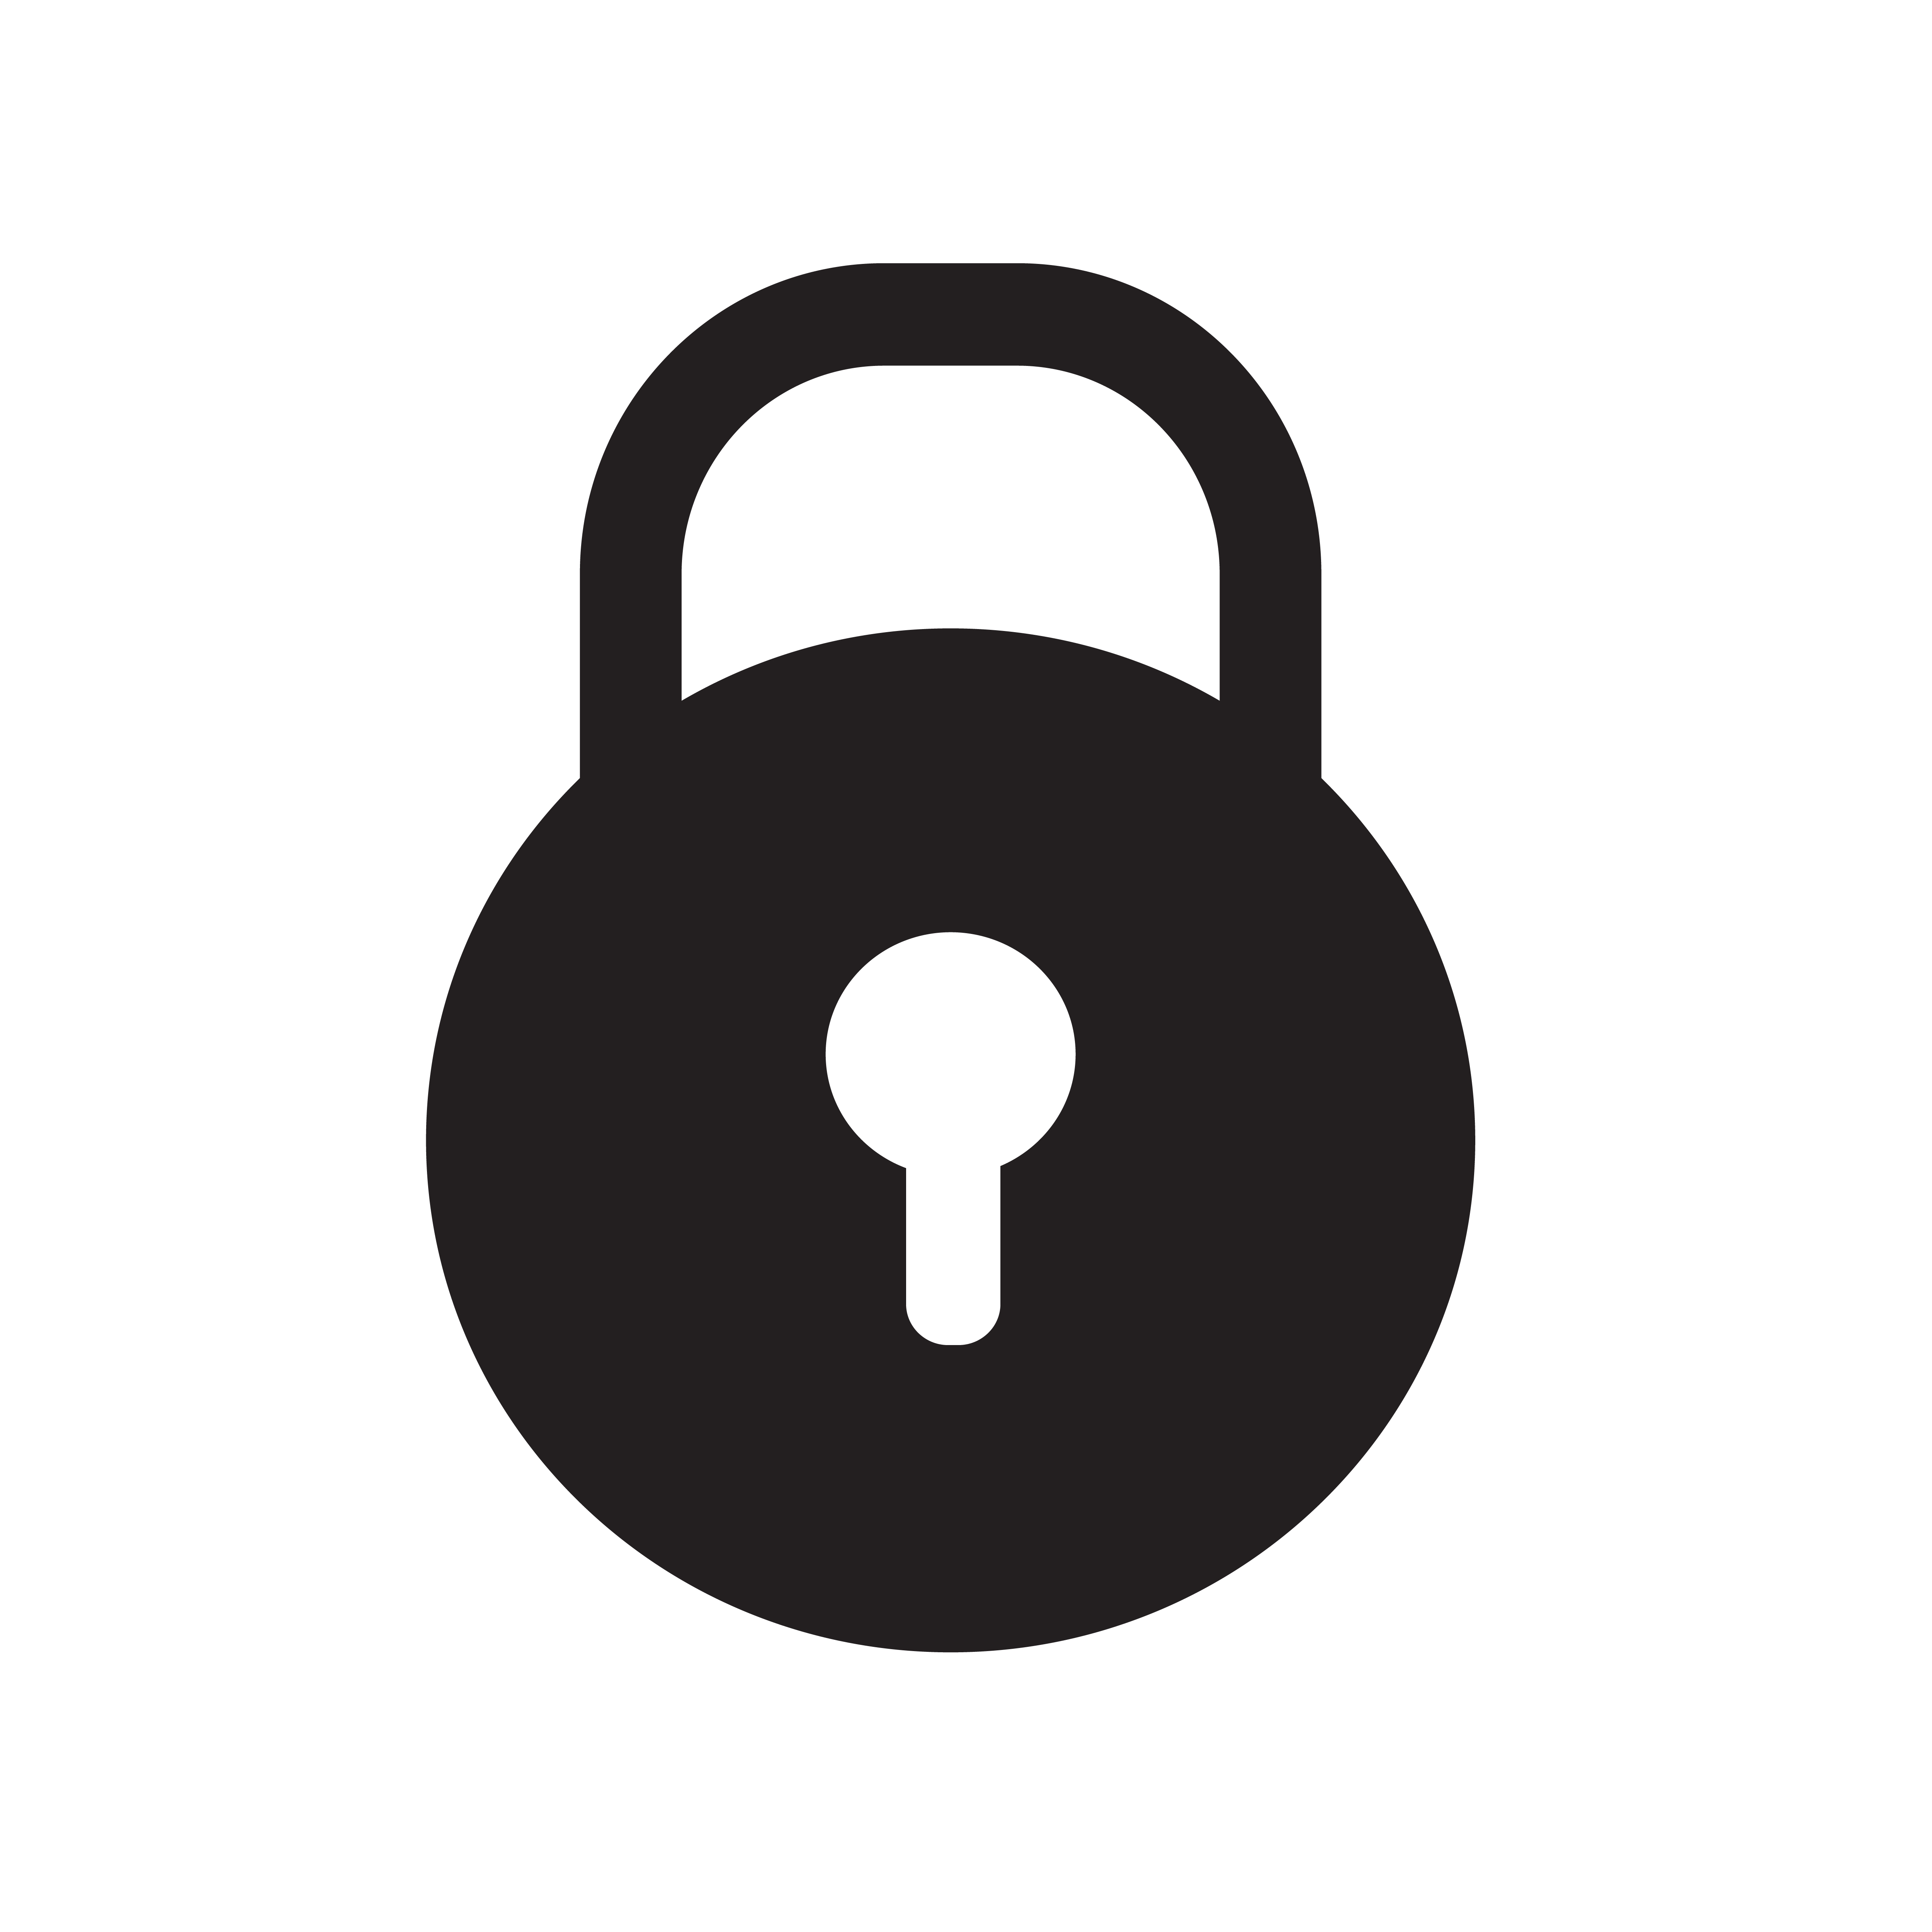 Computer Logo Design Template: Lock Icon Vector Illustration 581777